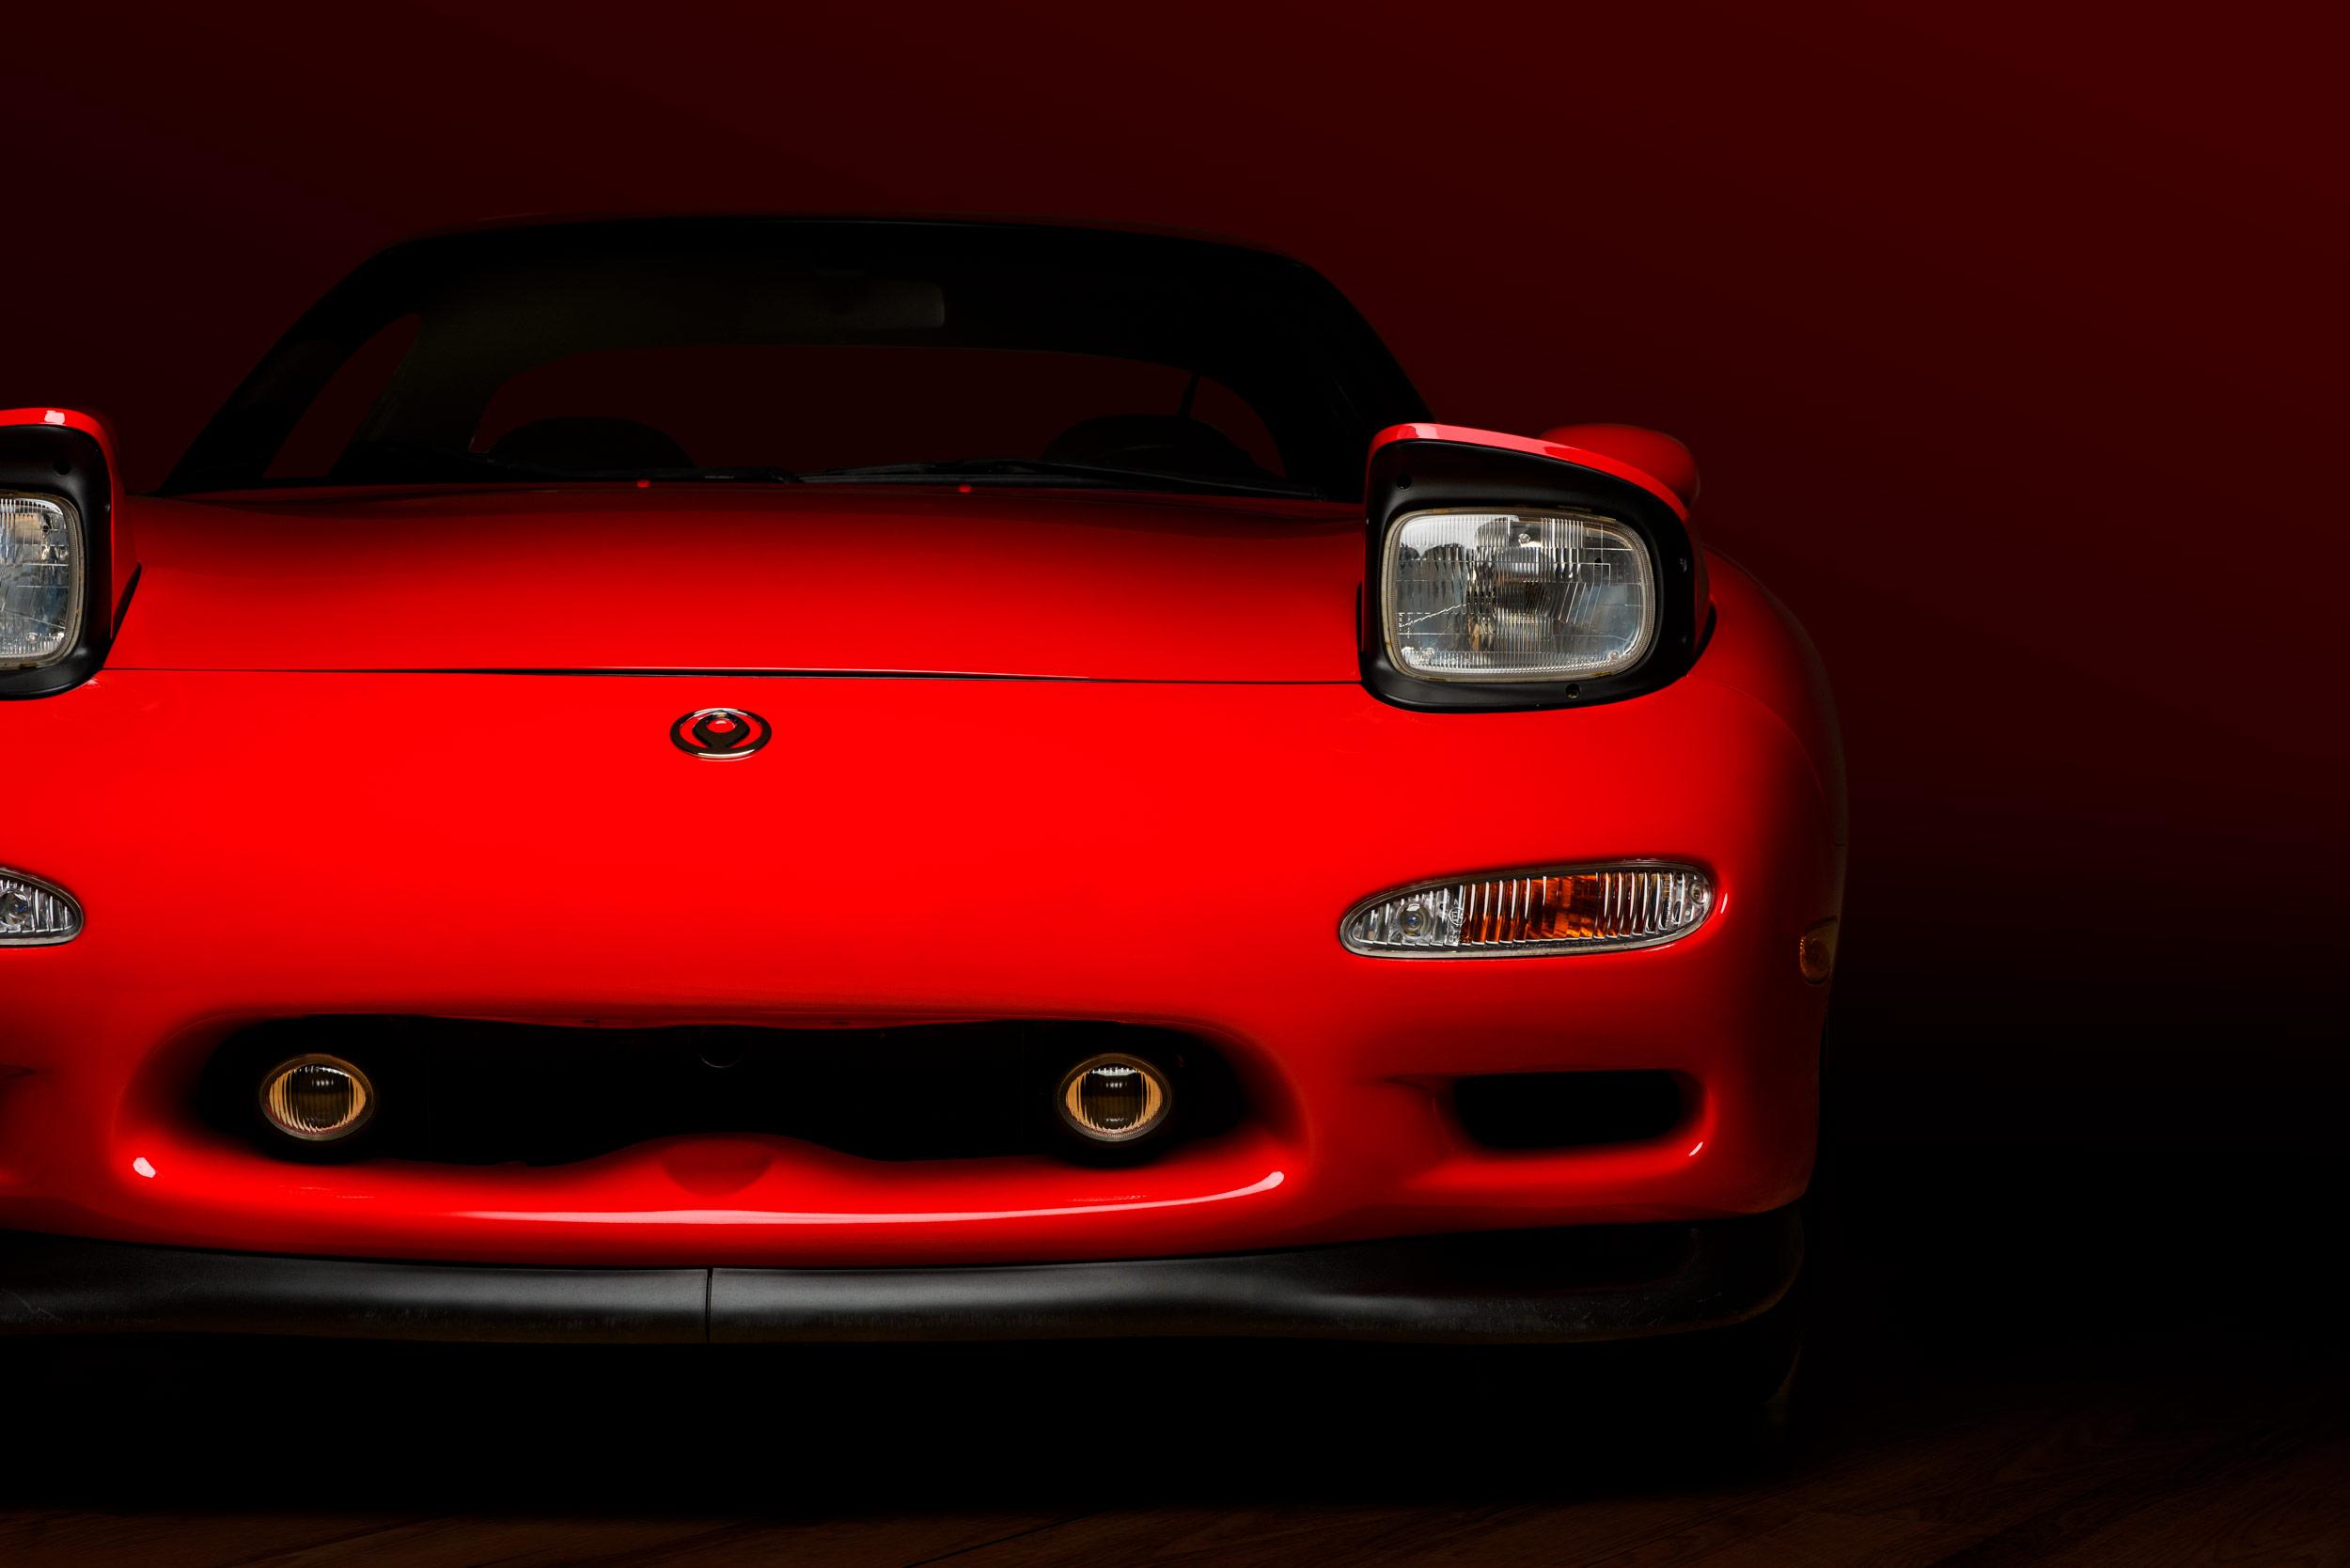 90s-Cars-Gear-Patrol-FINAL.jpg